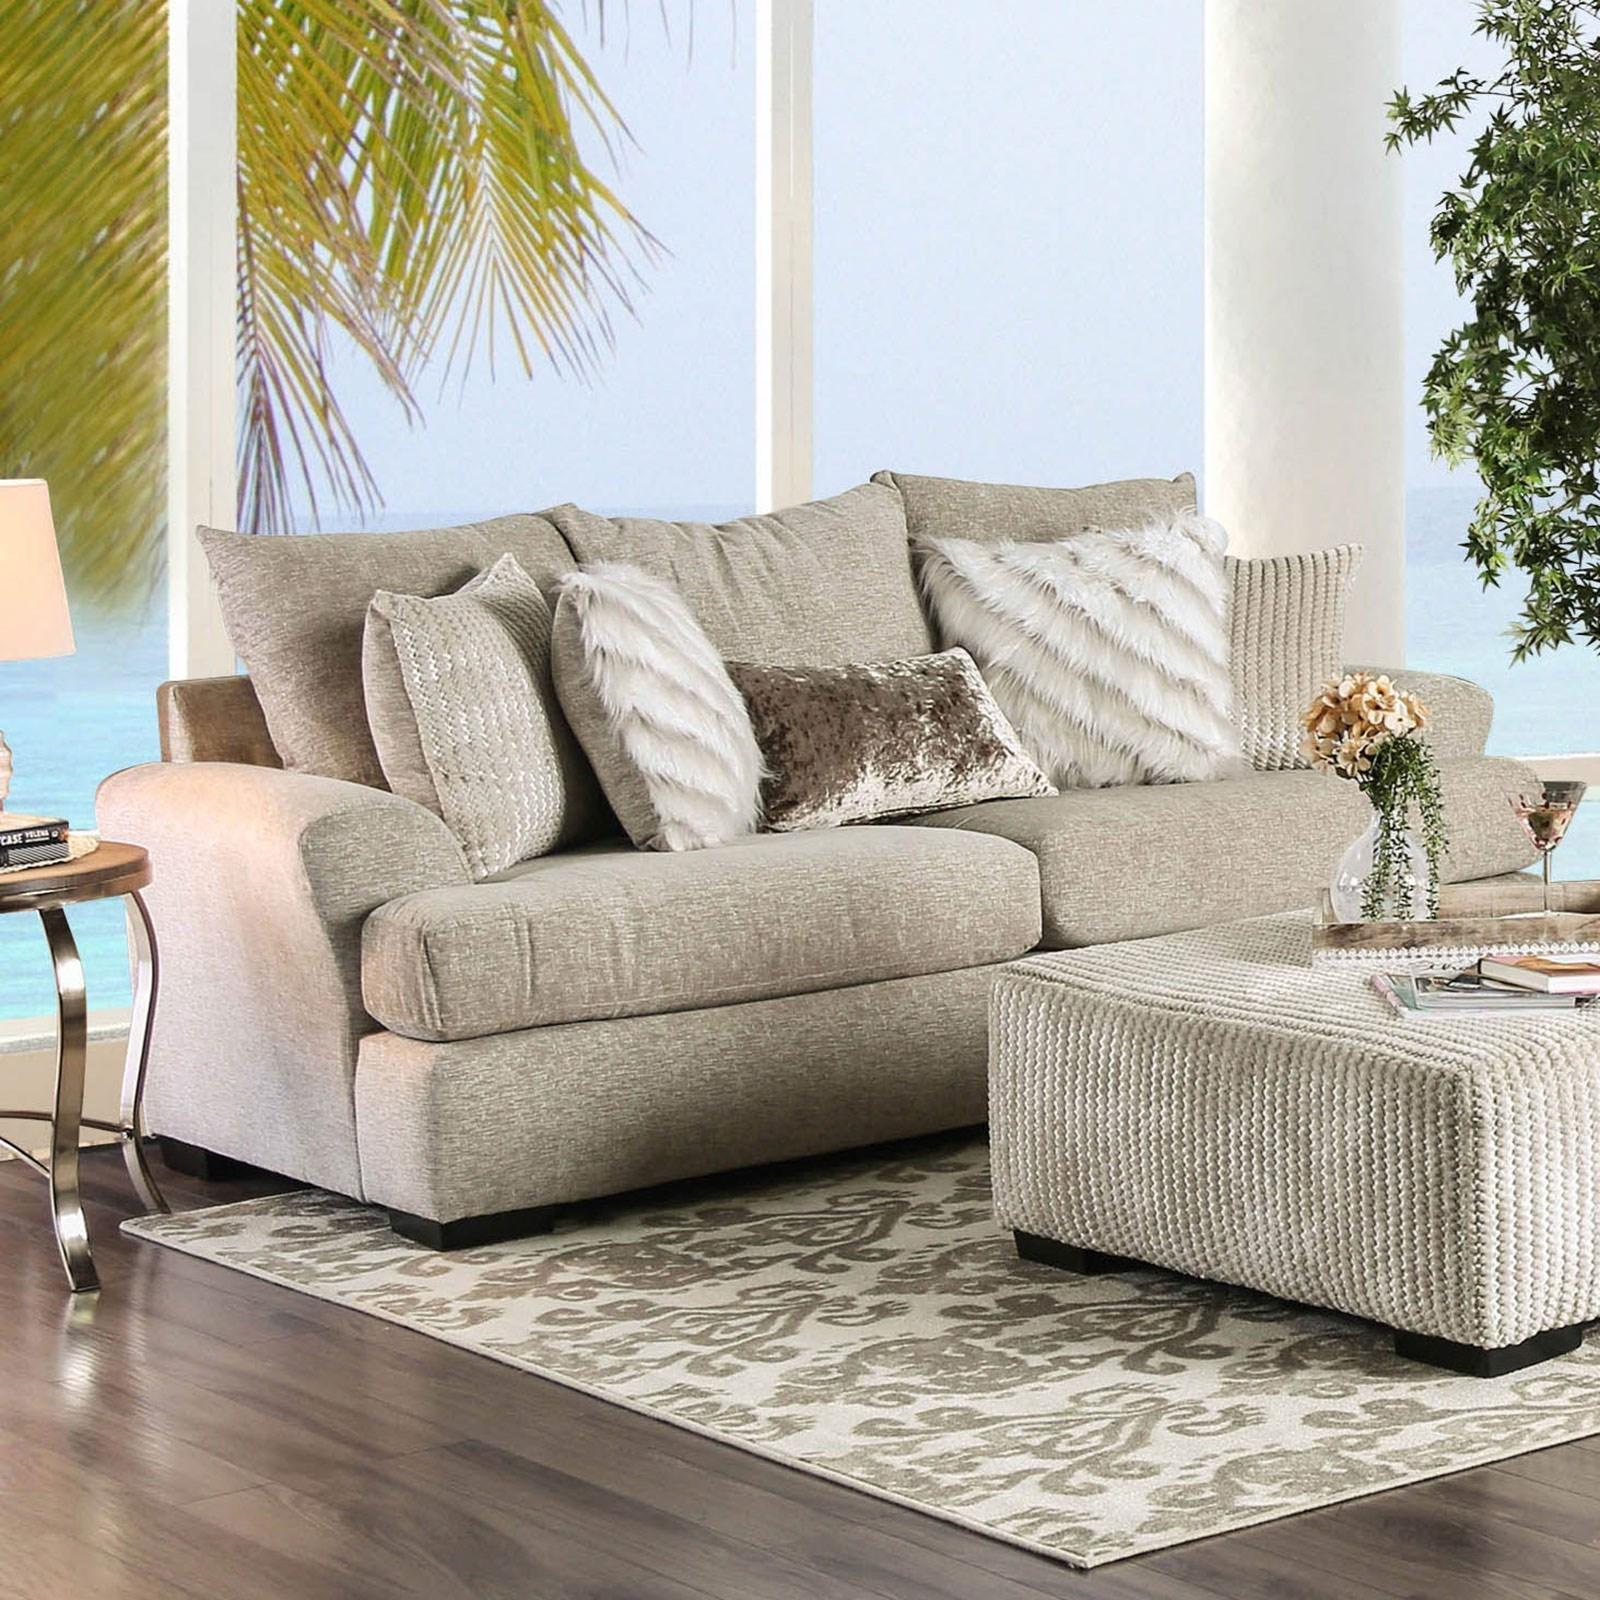 Anthea Sofa at Household Furniture